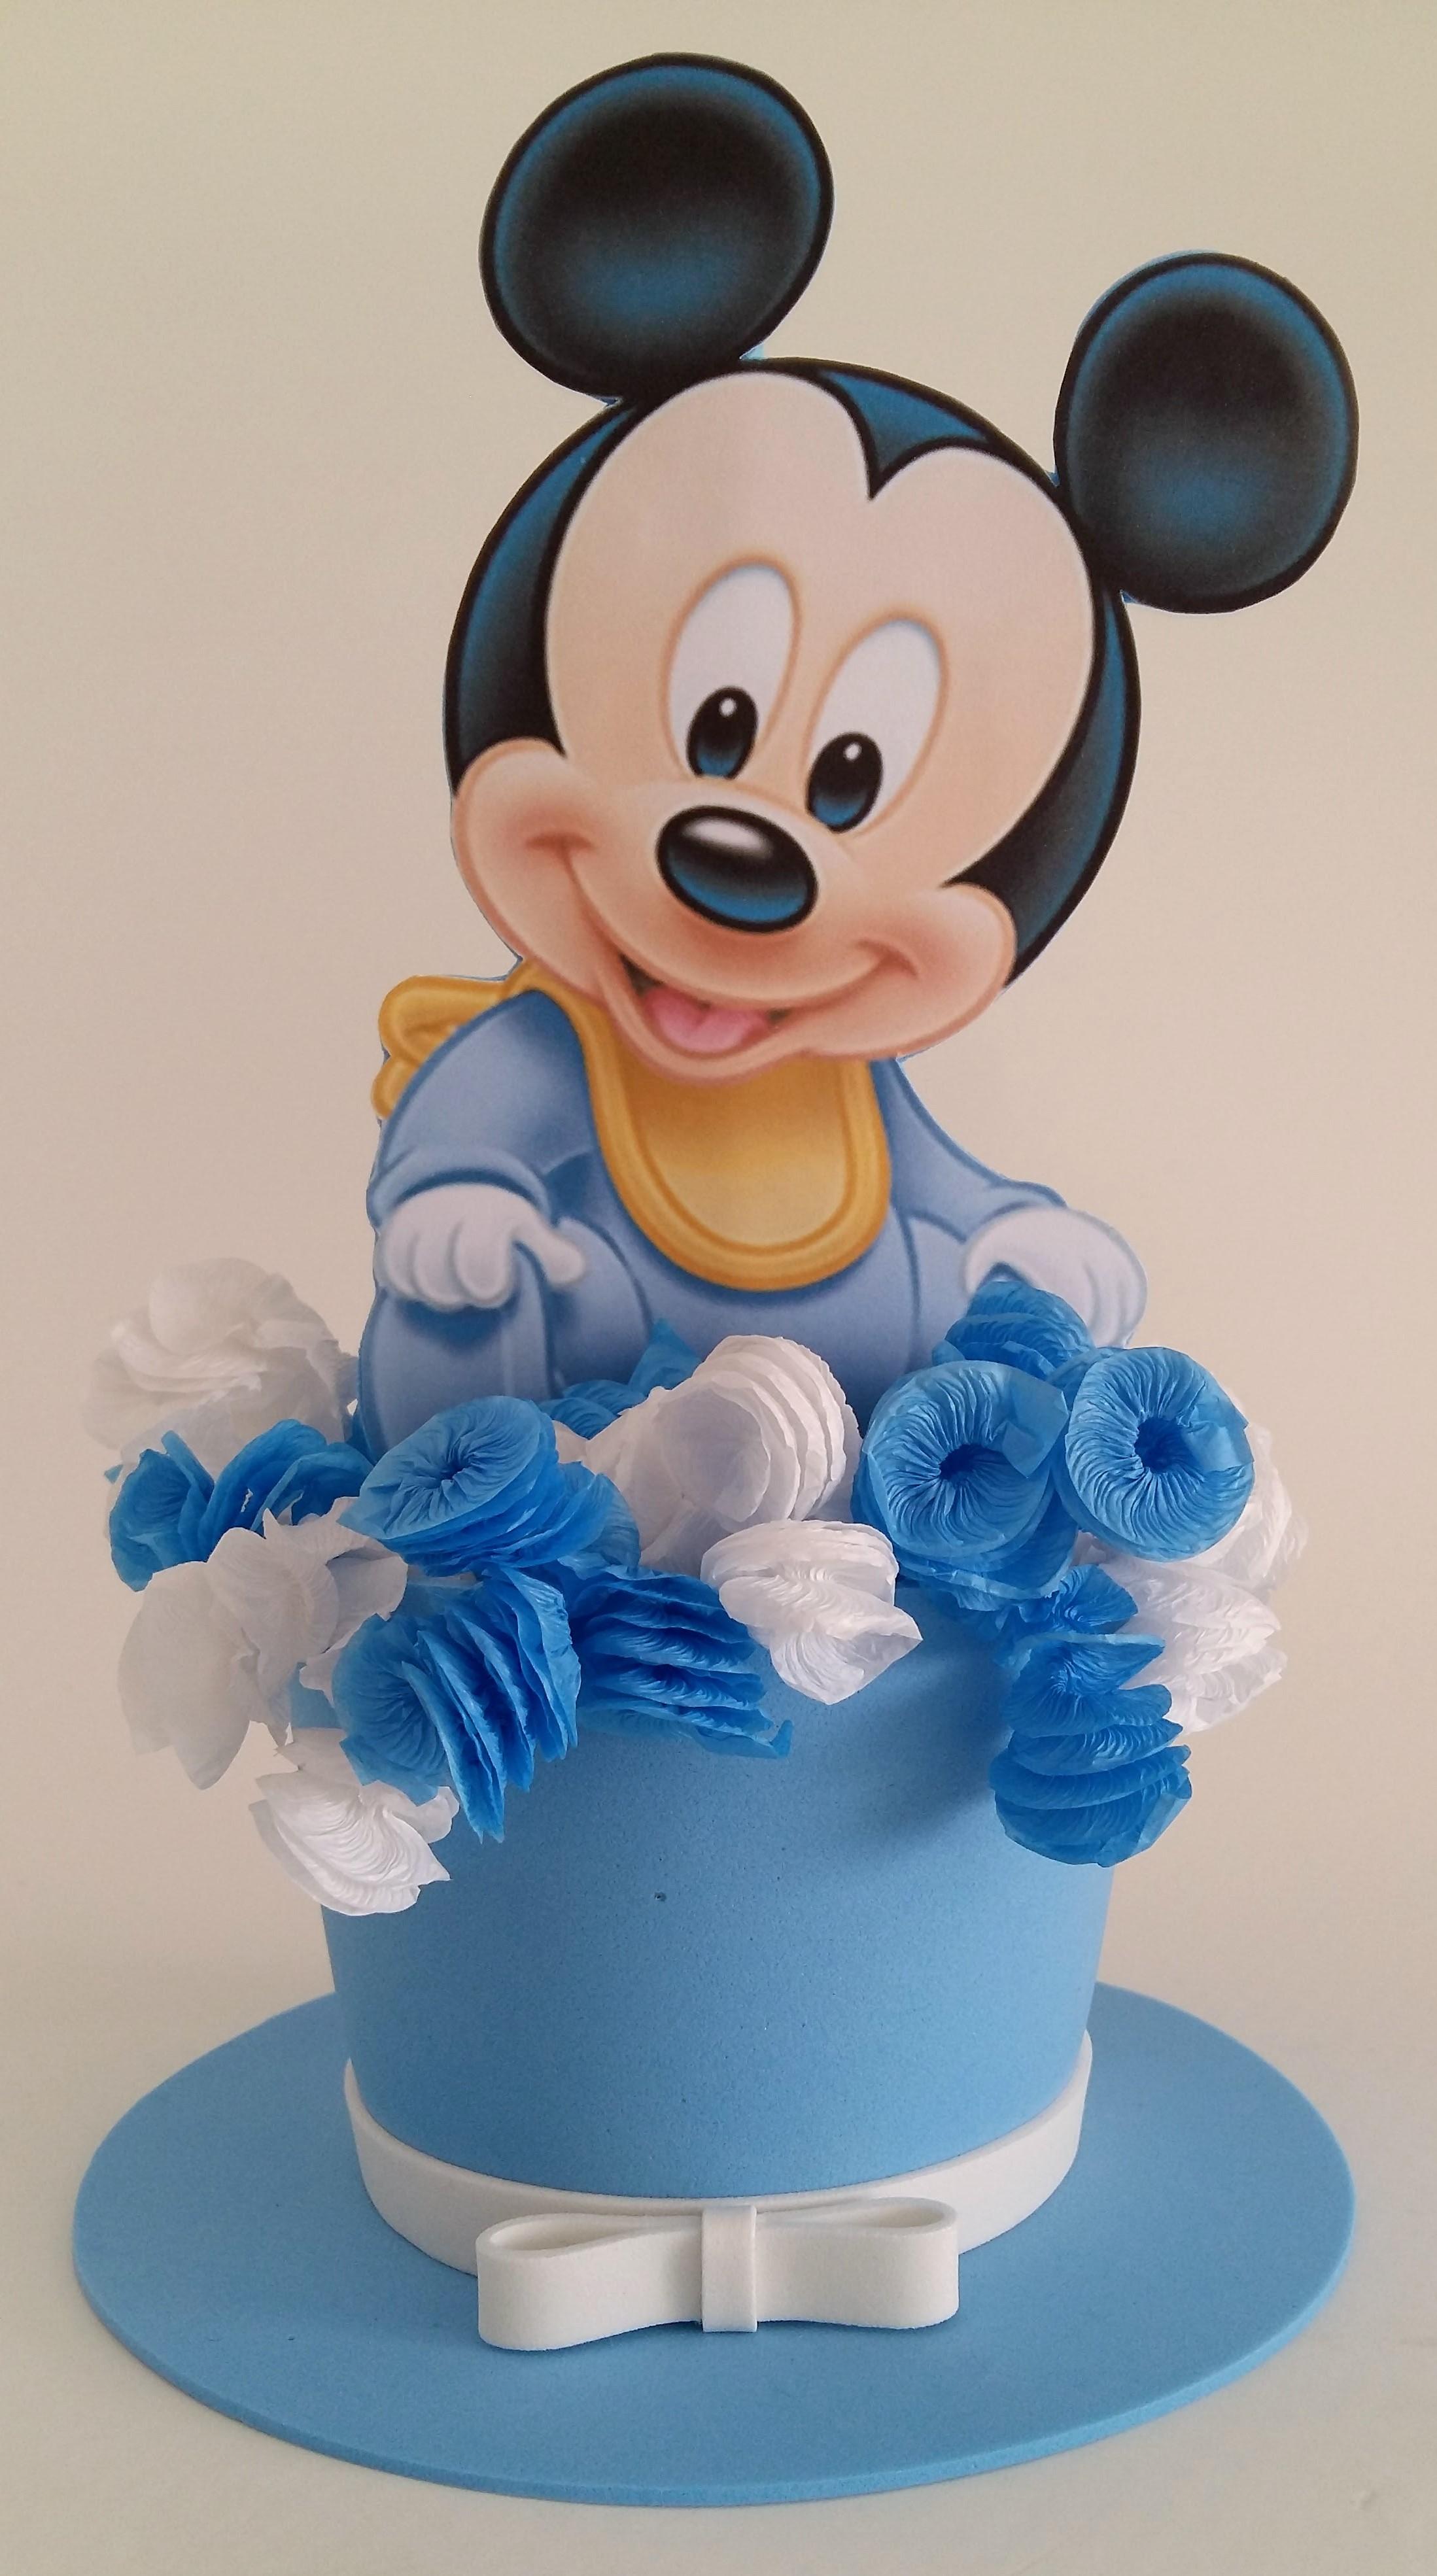 Centro de mesa Mickey Baby no Elo7   Tiquinho de mim (9A6635)